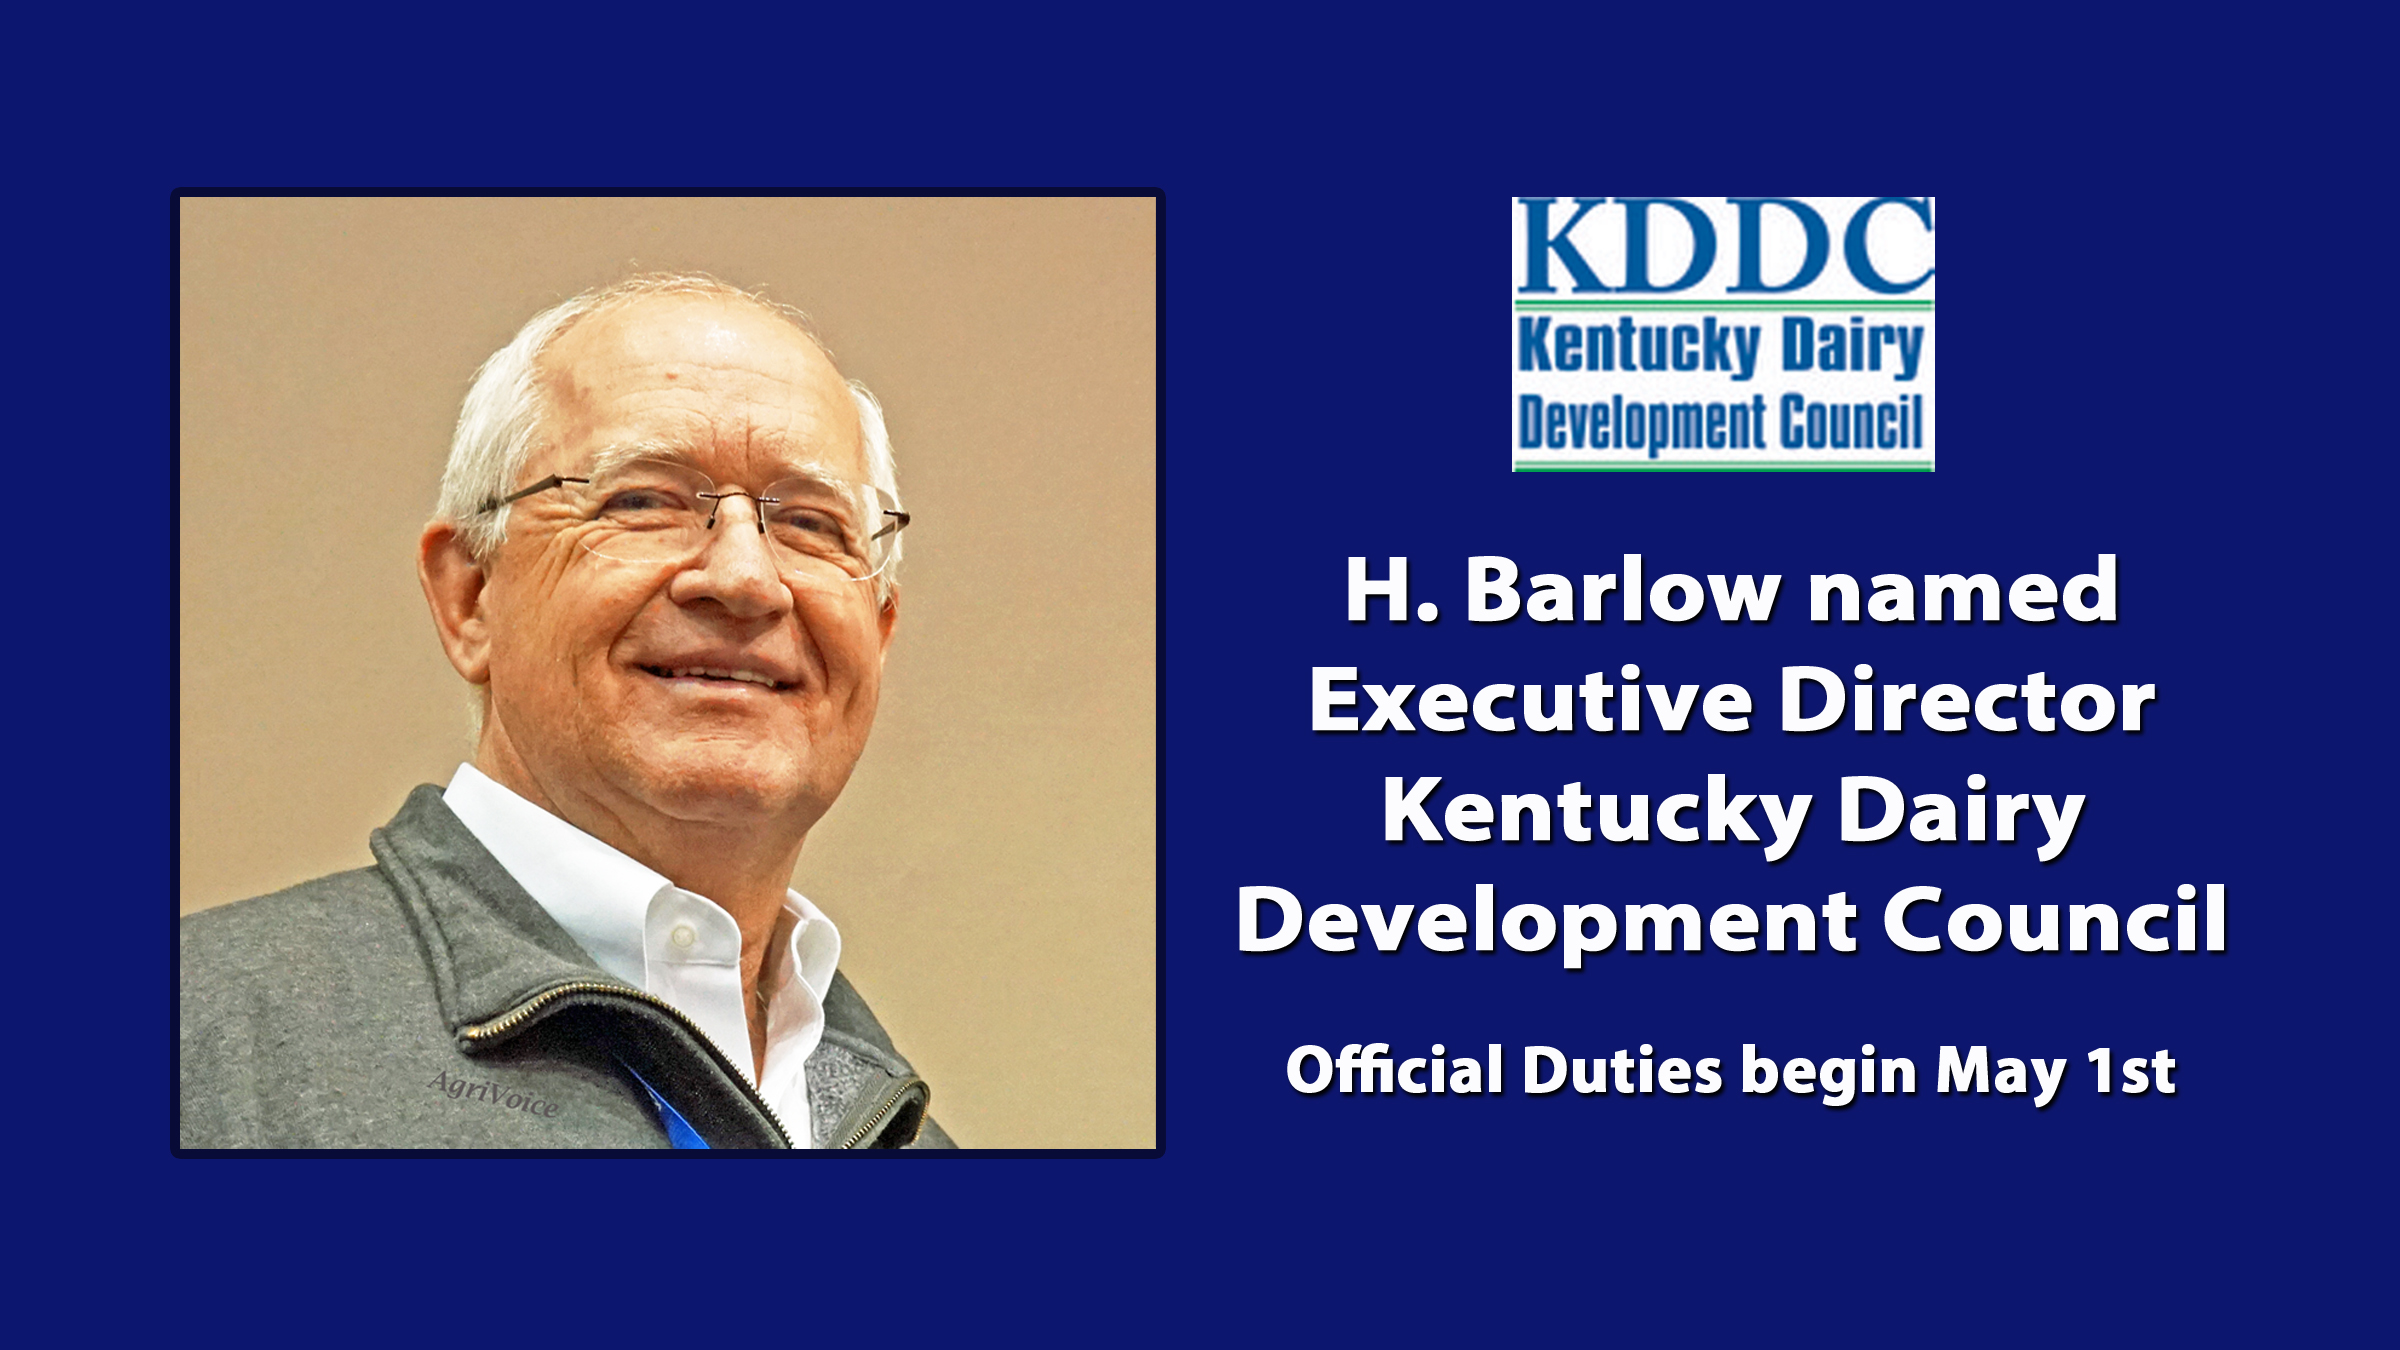 0000_KDDC_H_Barlow_Executive_Director_S